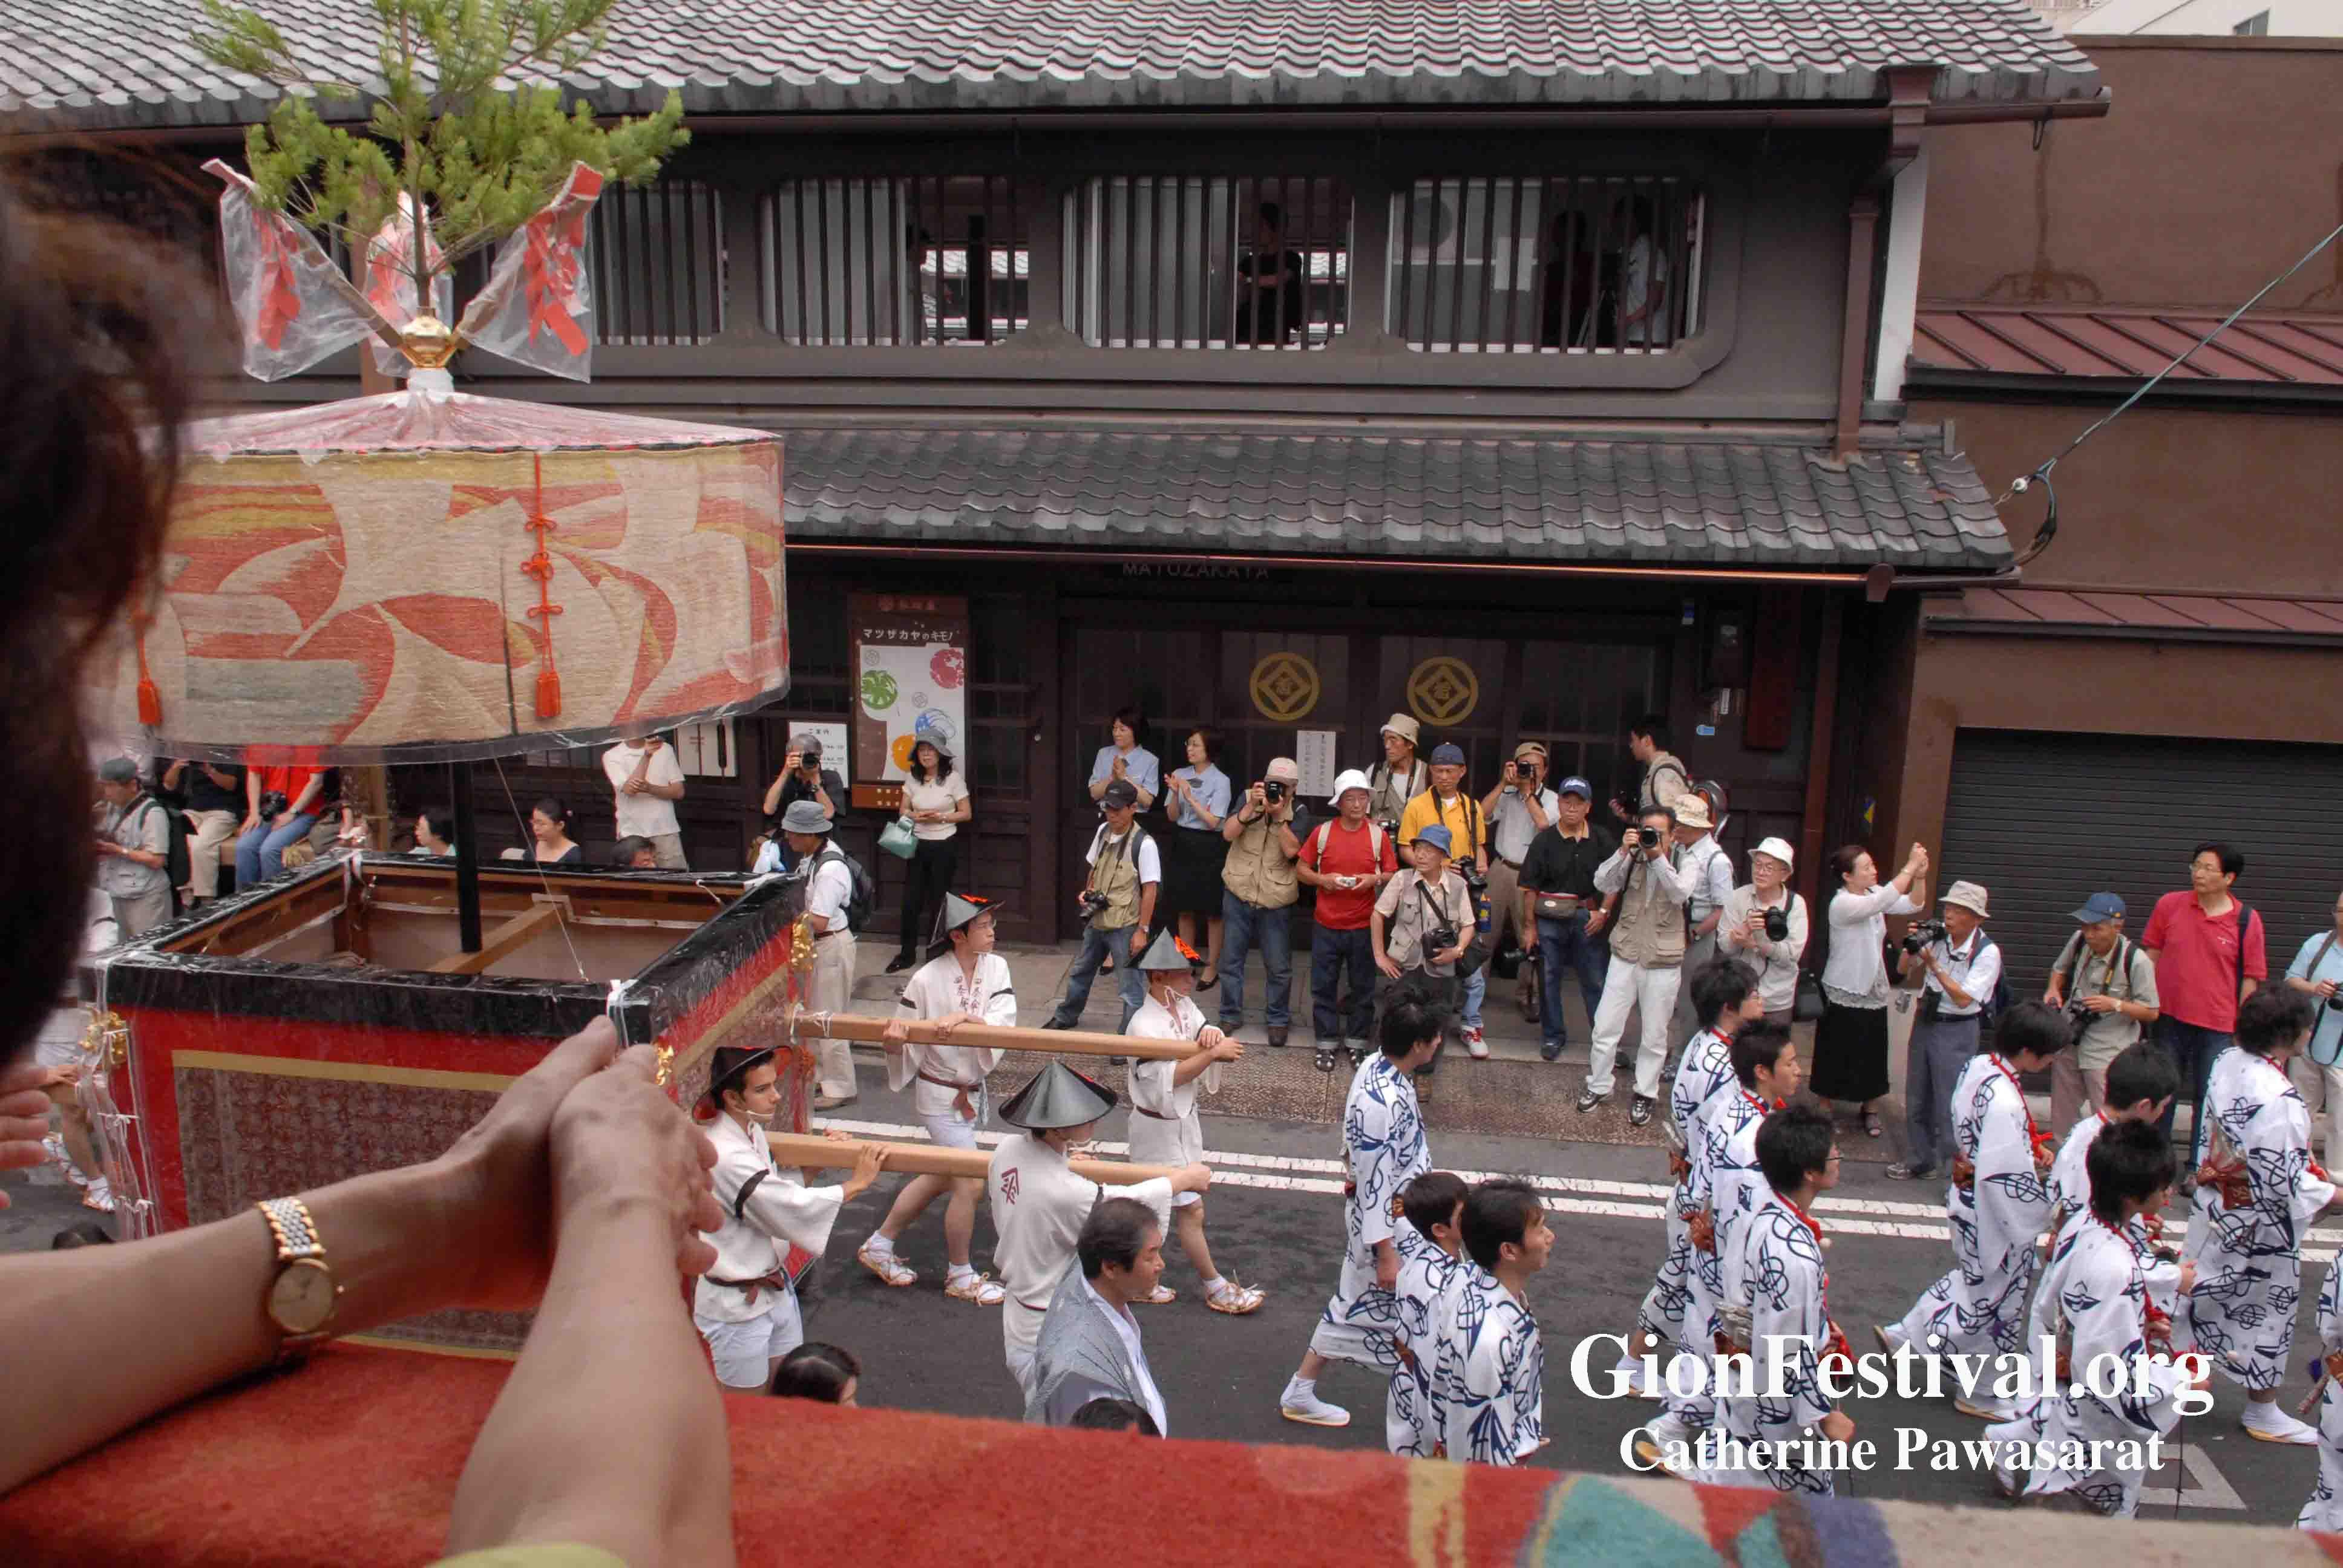 shijo kasa boko procession machiya townhouse matsuzakaya gion festival kyoto japan